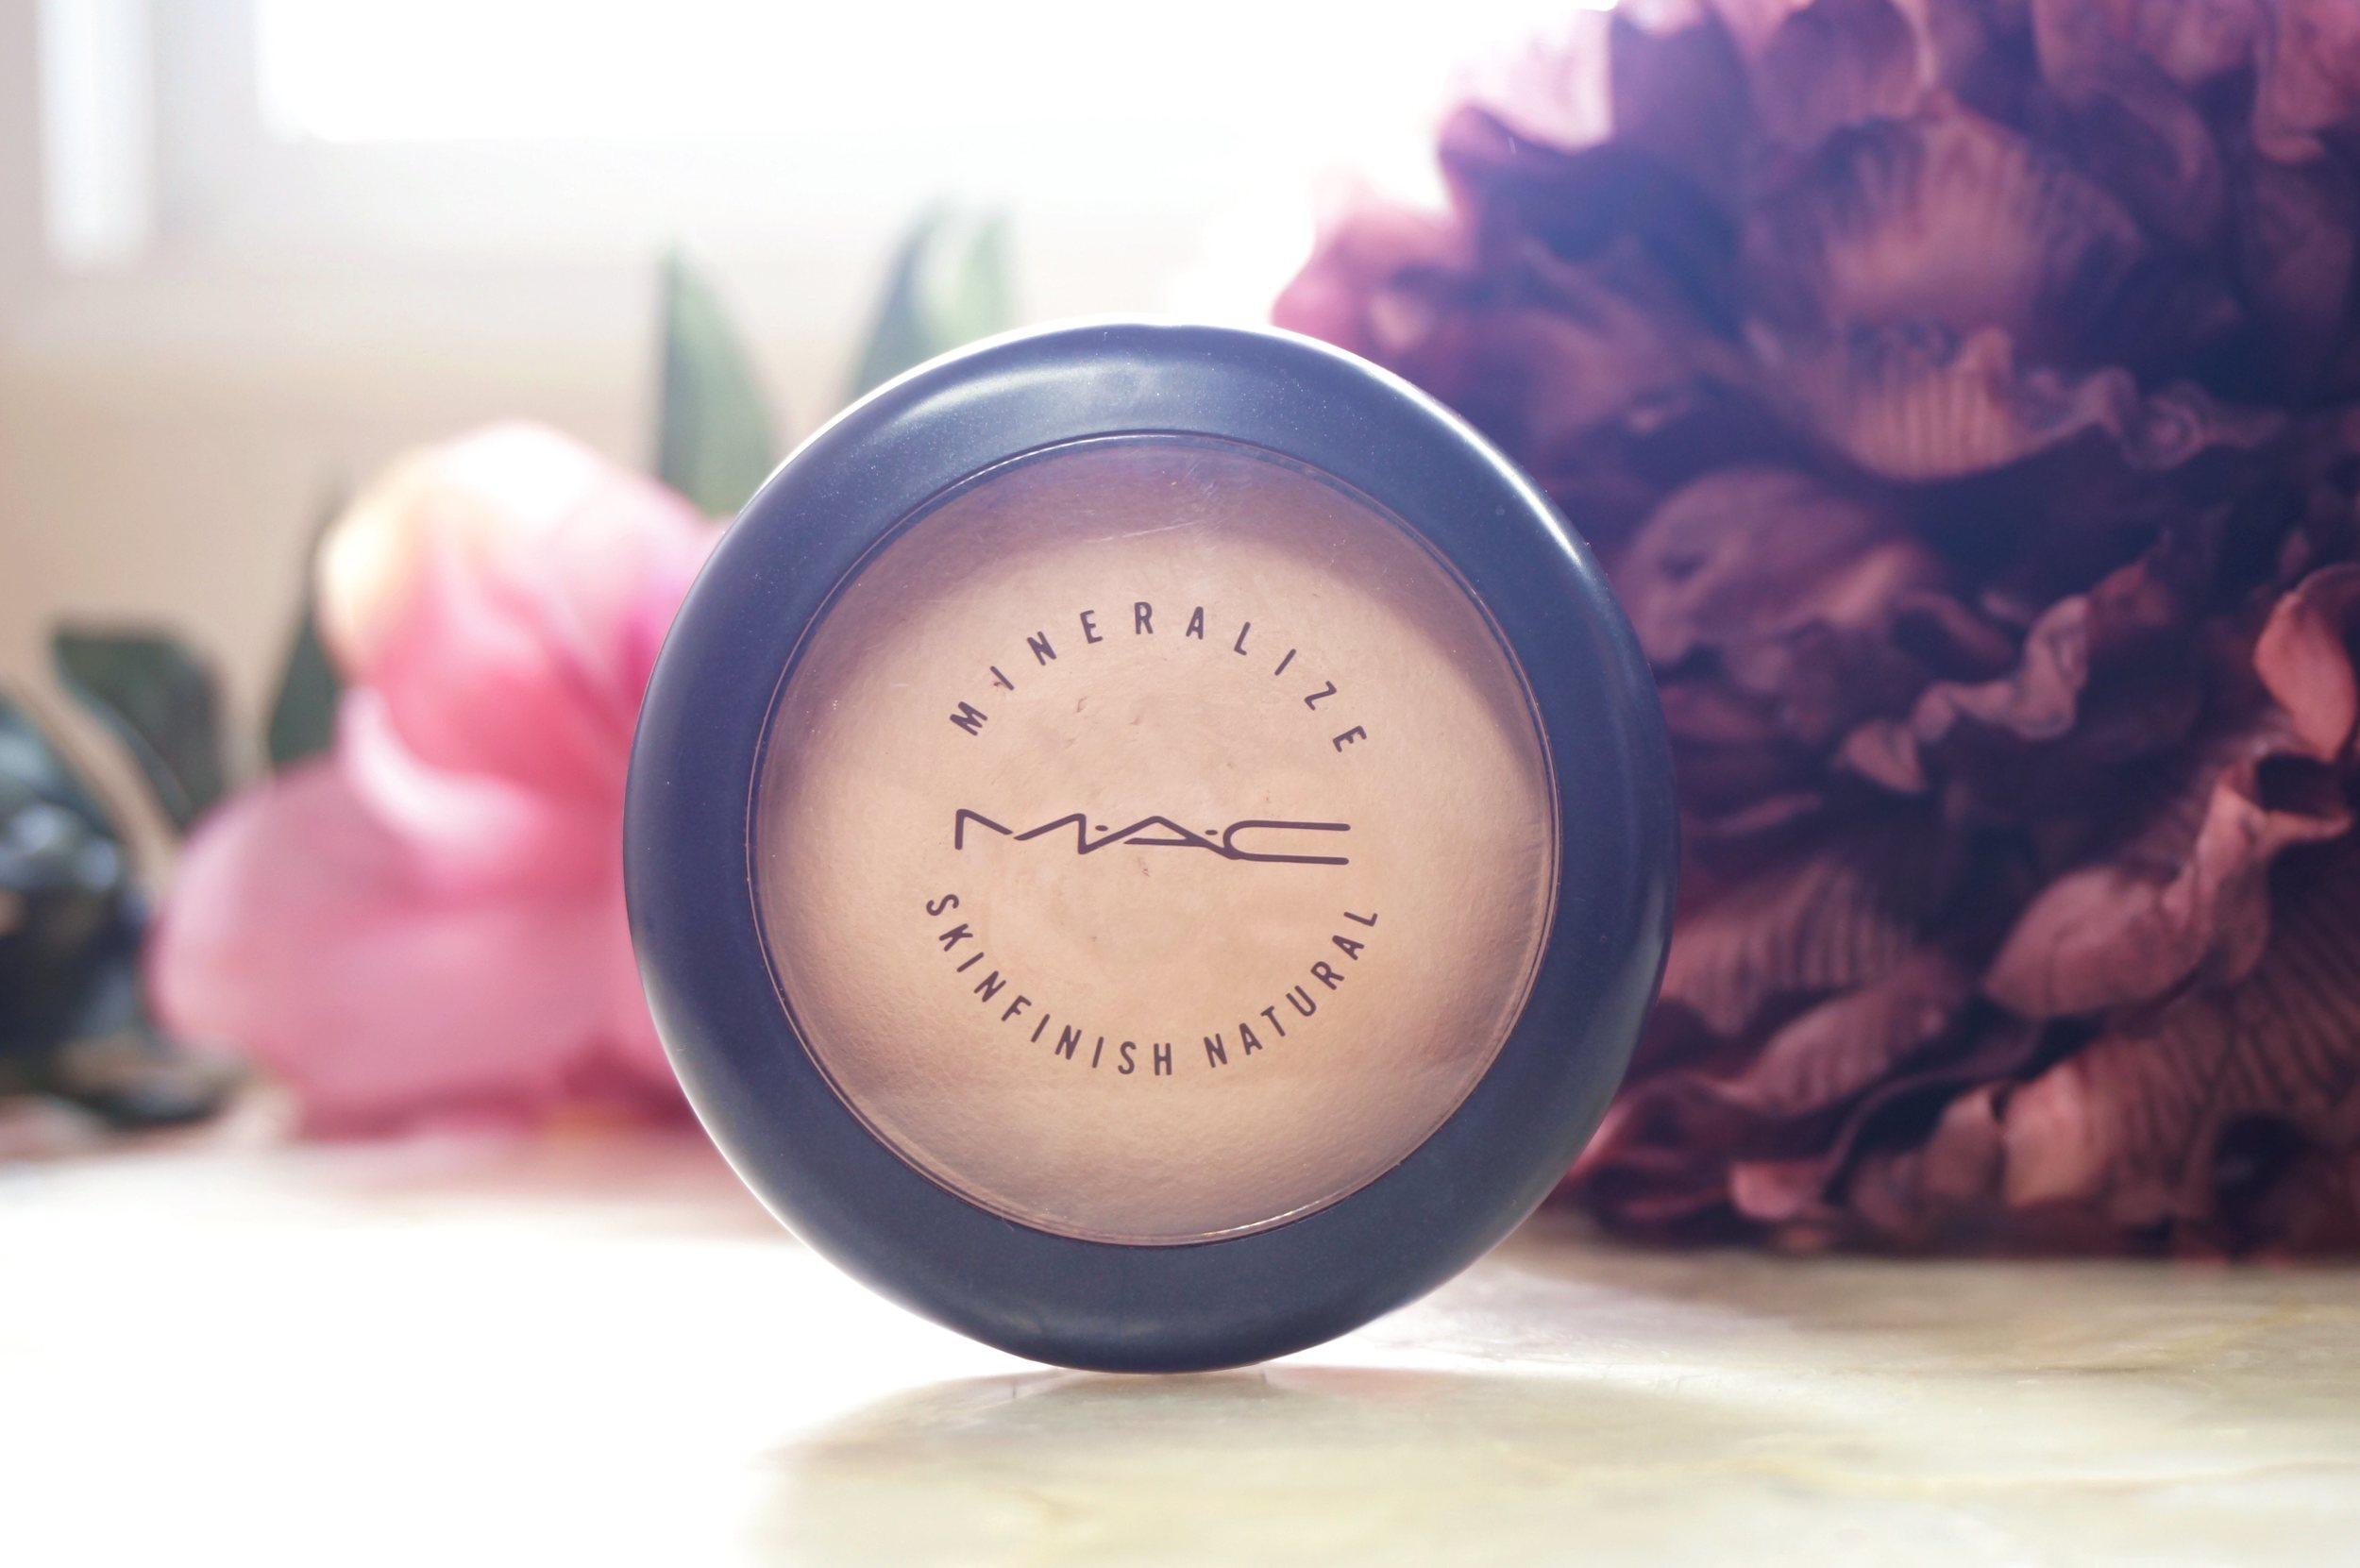 Image via makeupandbeautyblog.com